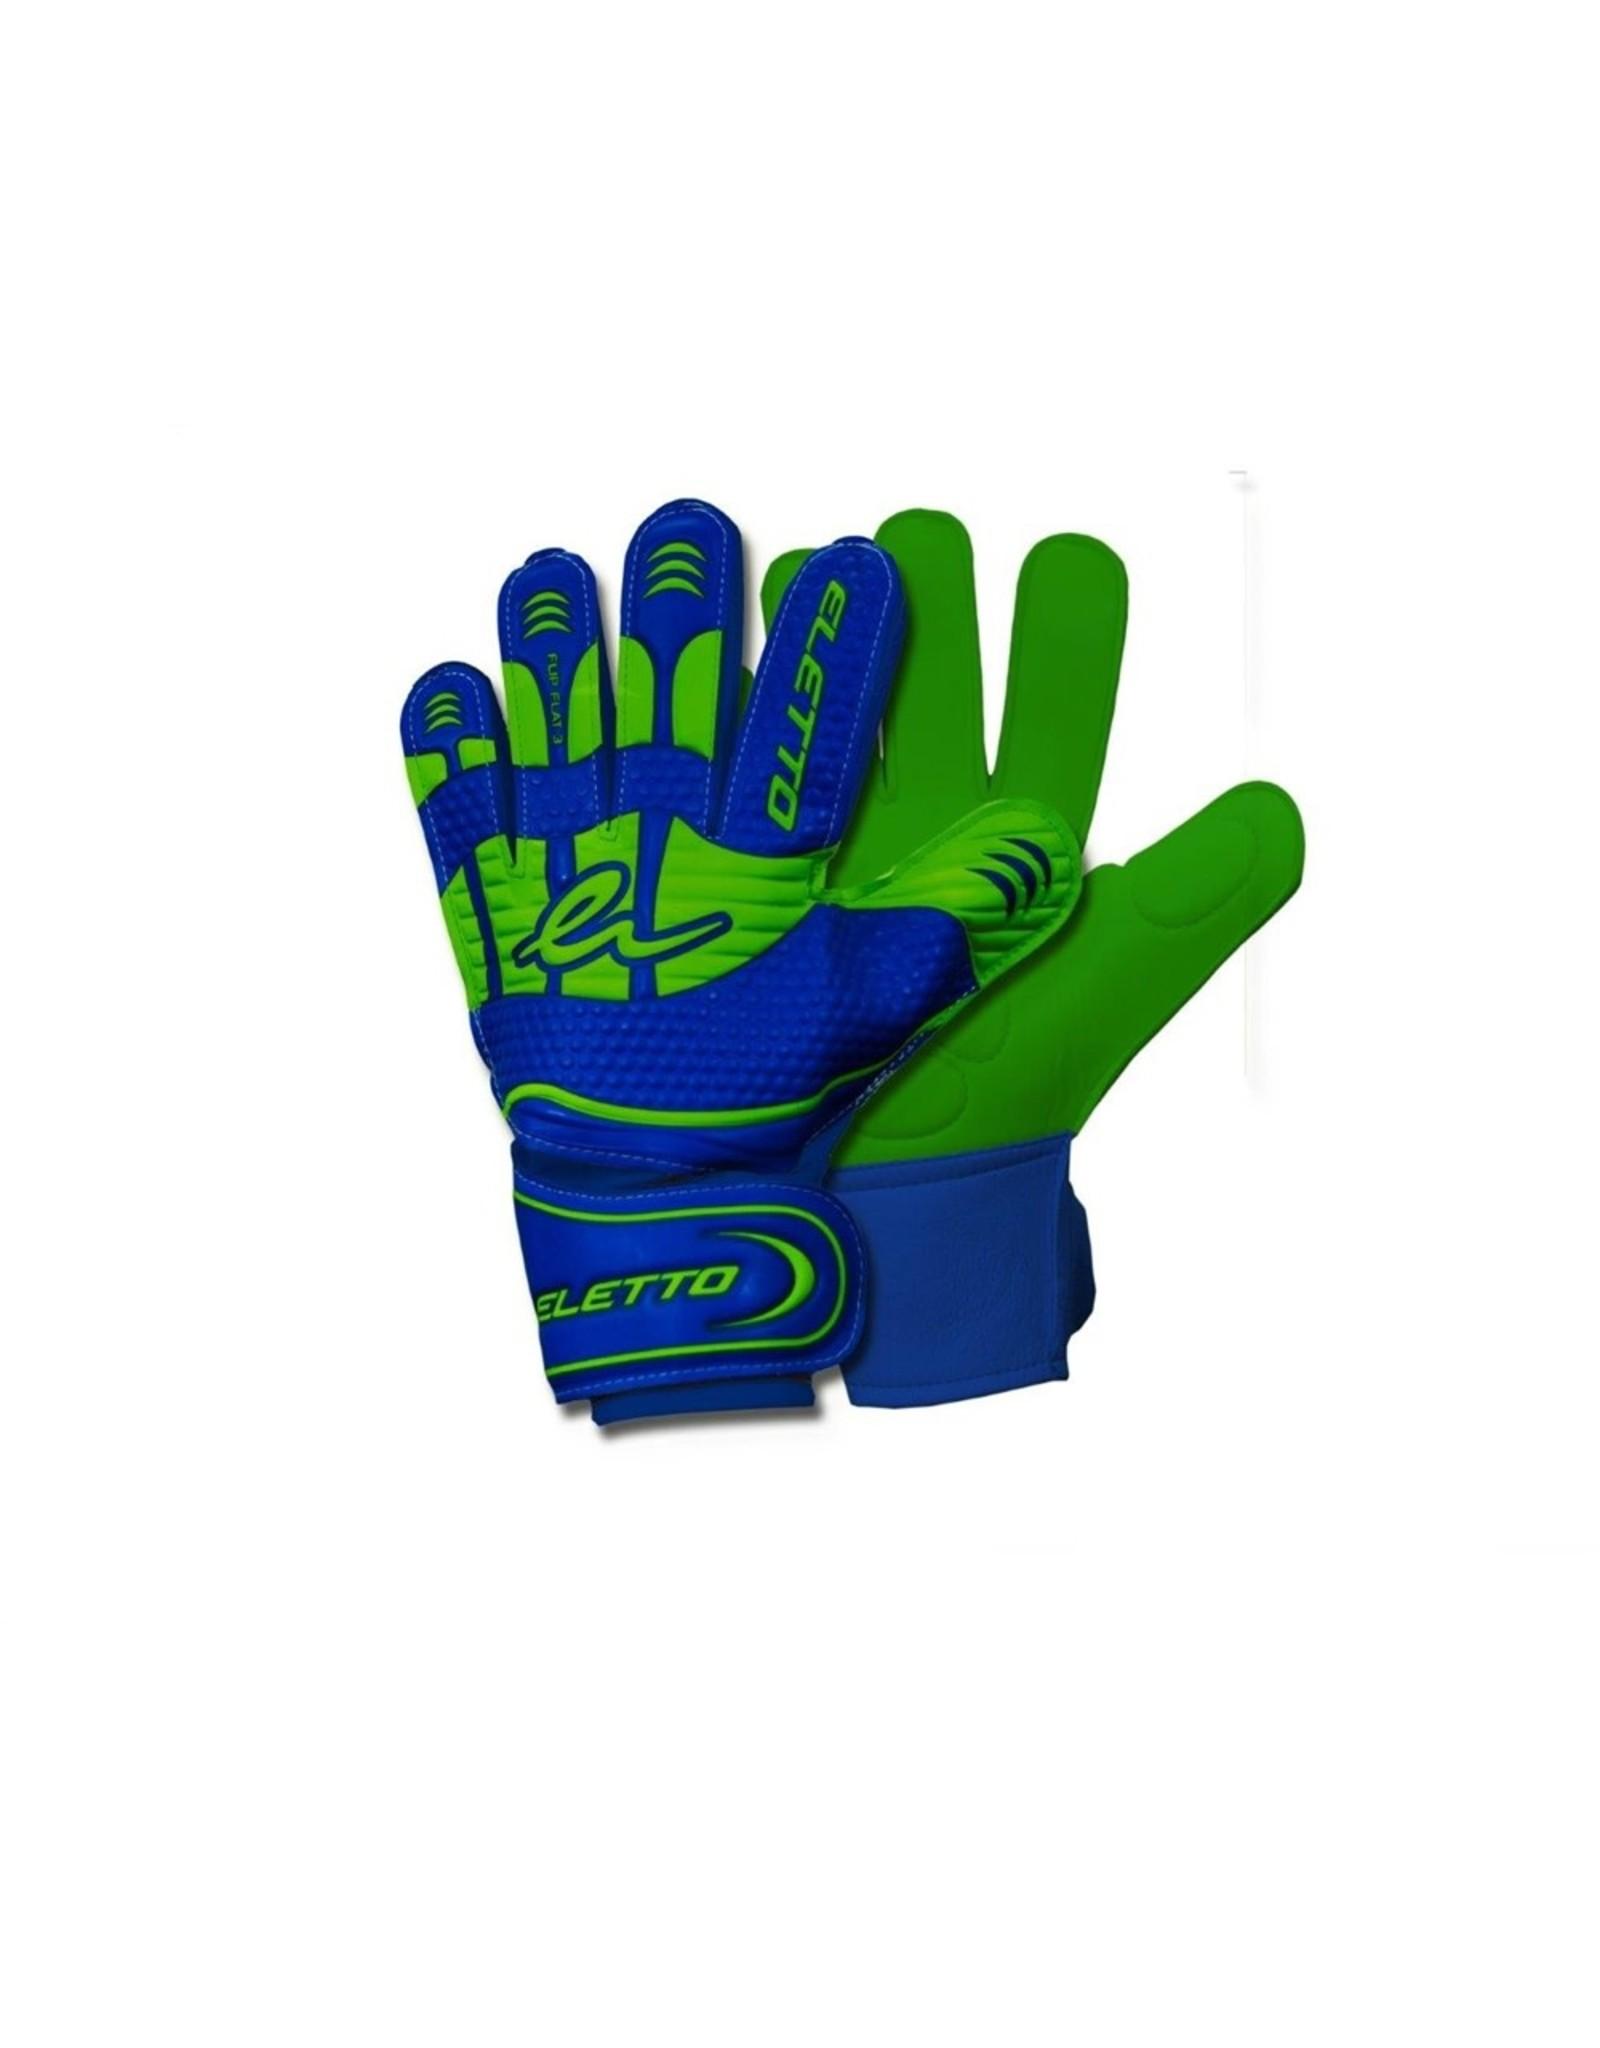 Eletto Eletto Goalkeeper Gloves Flip IV Flat (Blue/Neon Green)